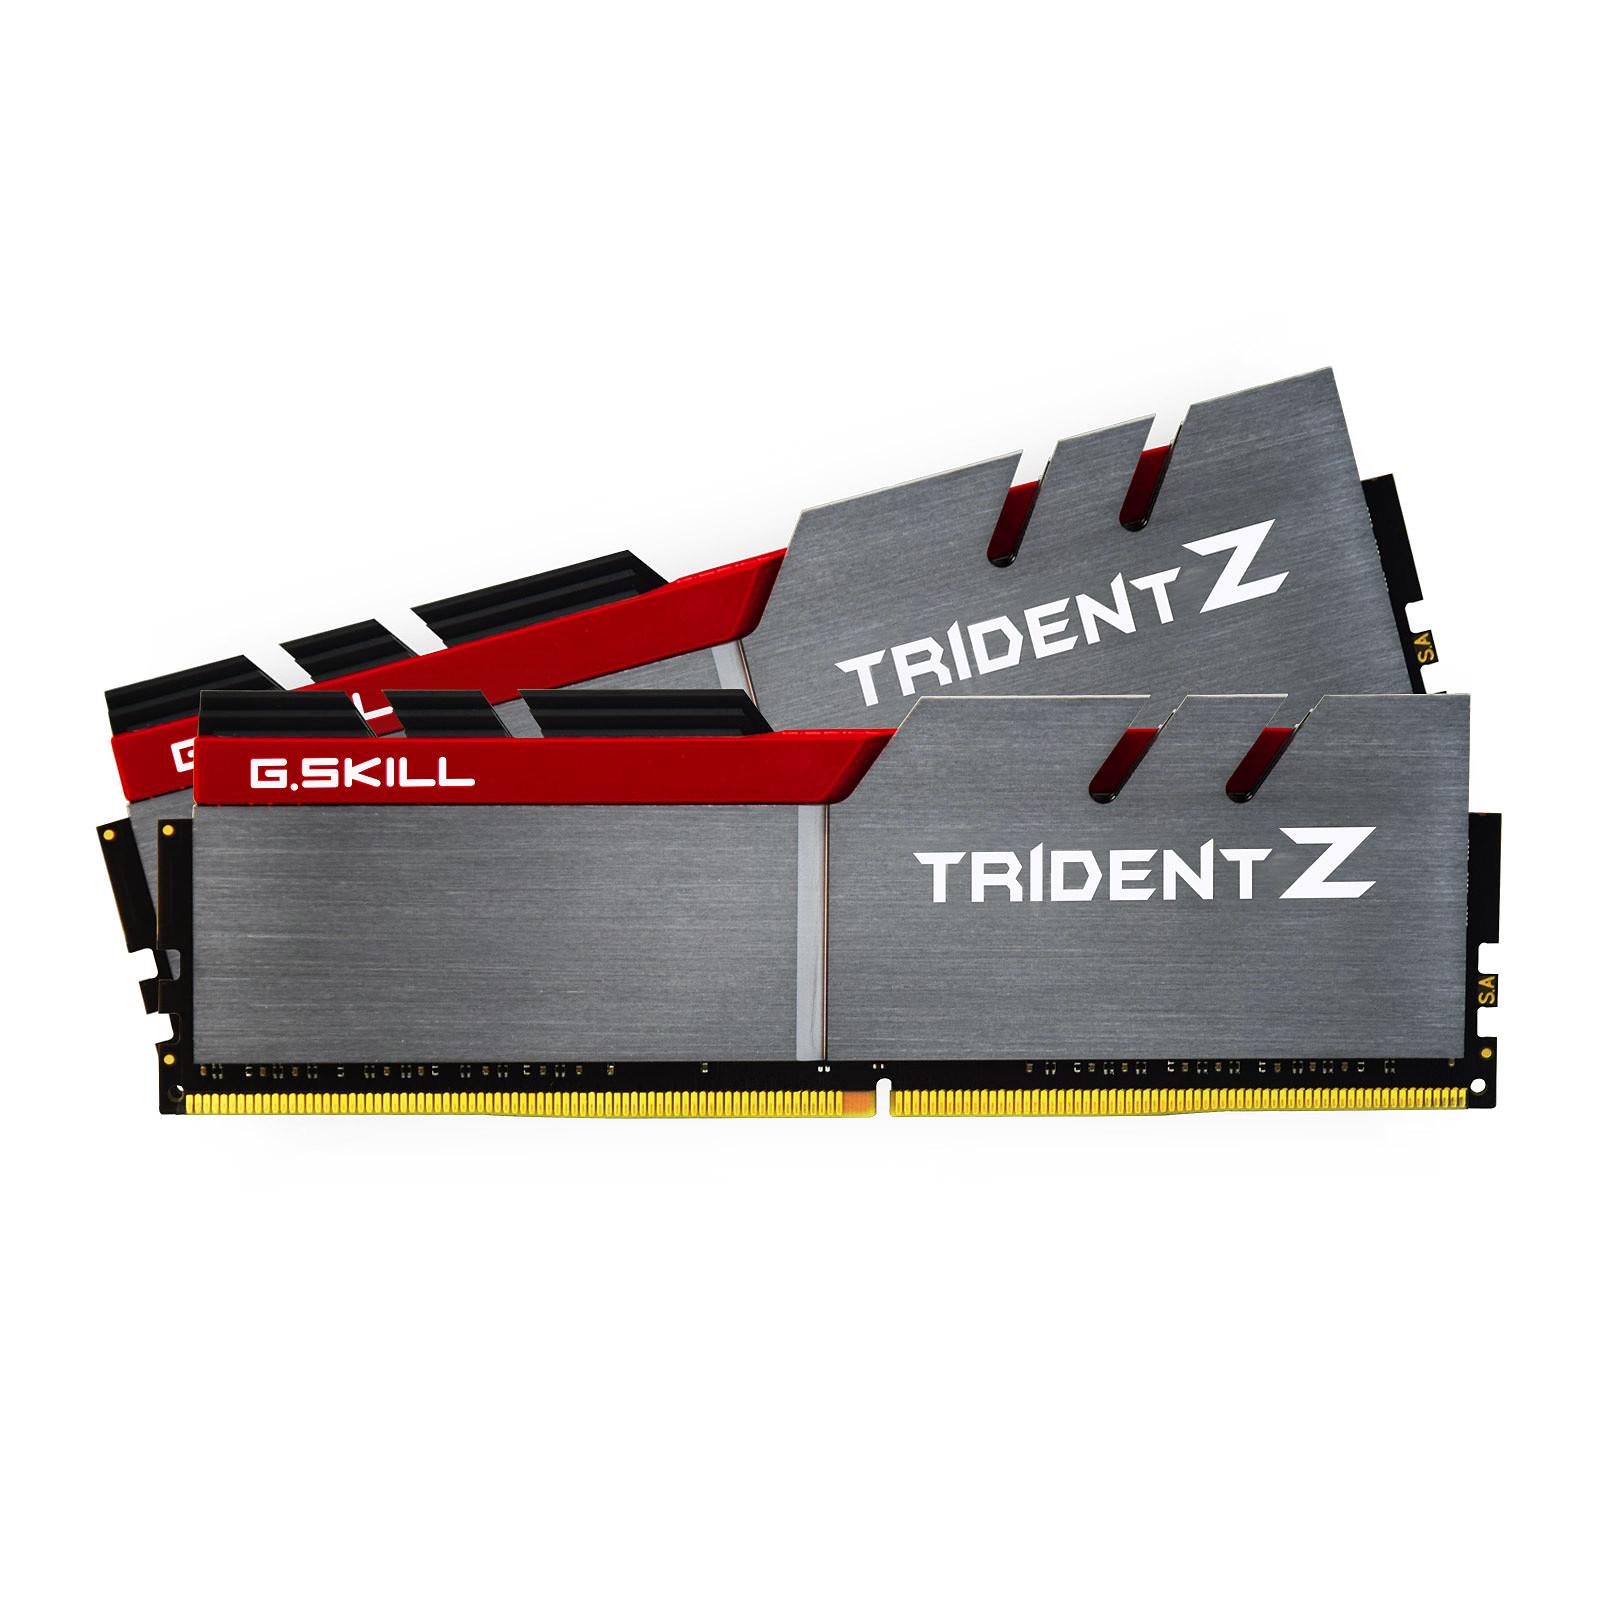 G.Skill Trident Z 8 Go (2x 4 Go) DDR4 3866 MHz CL18